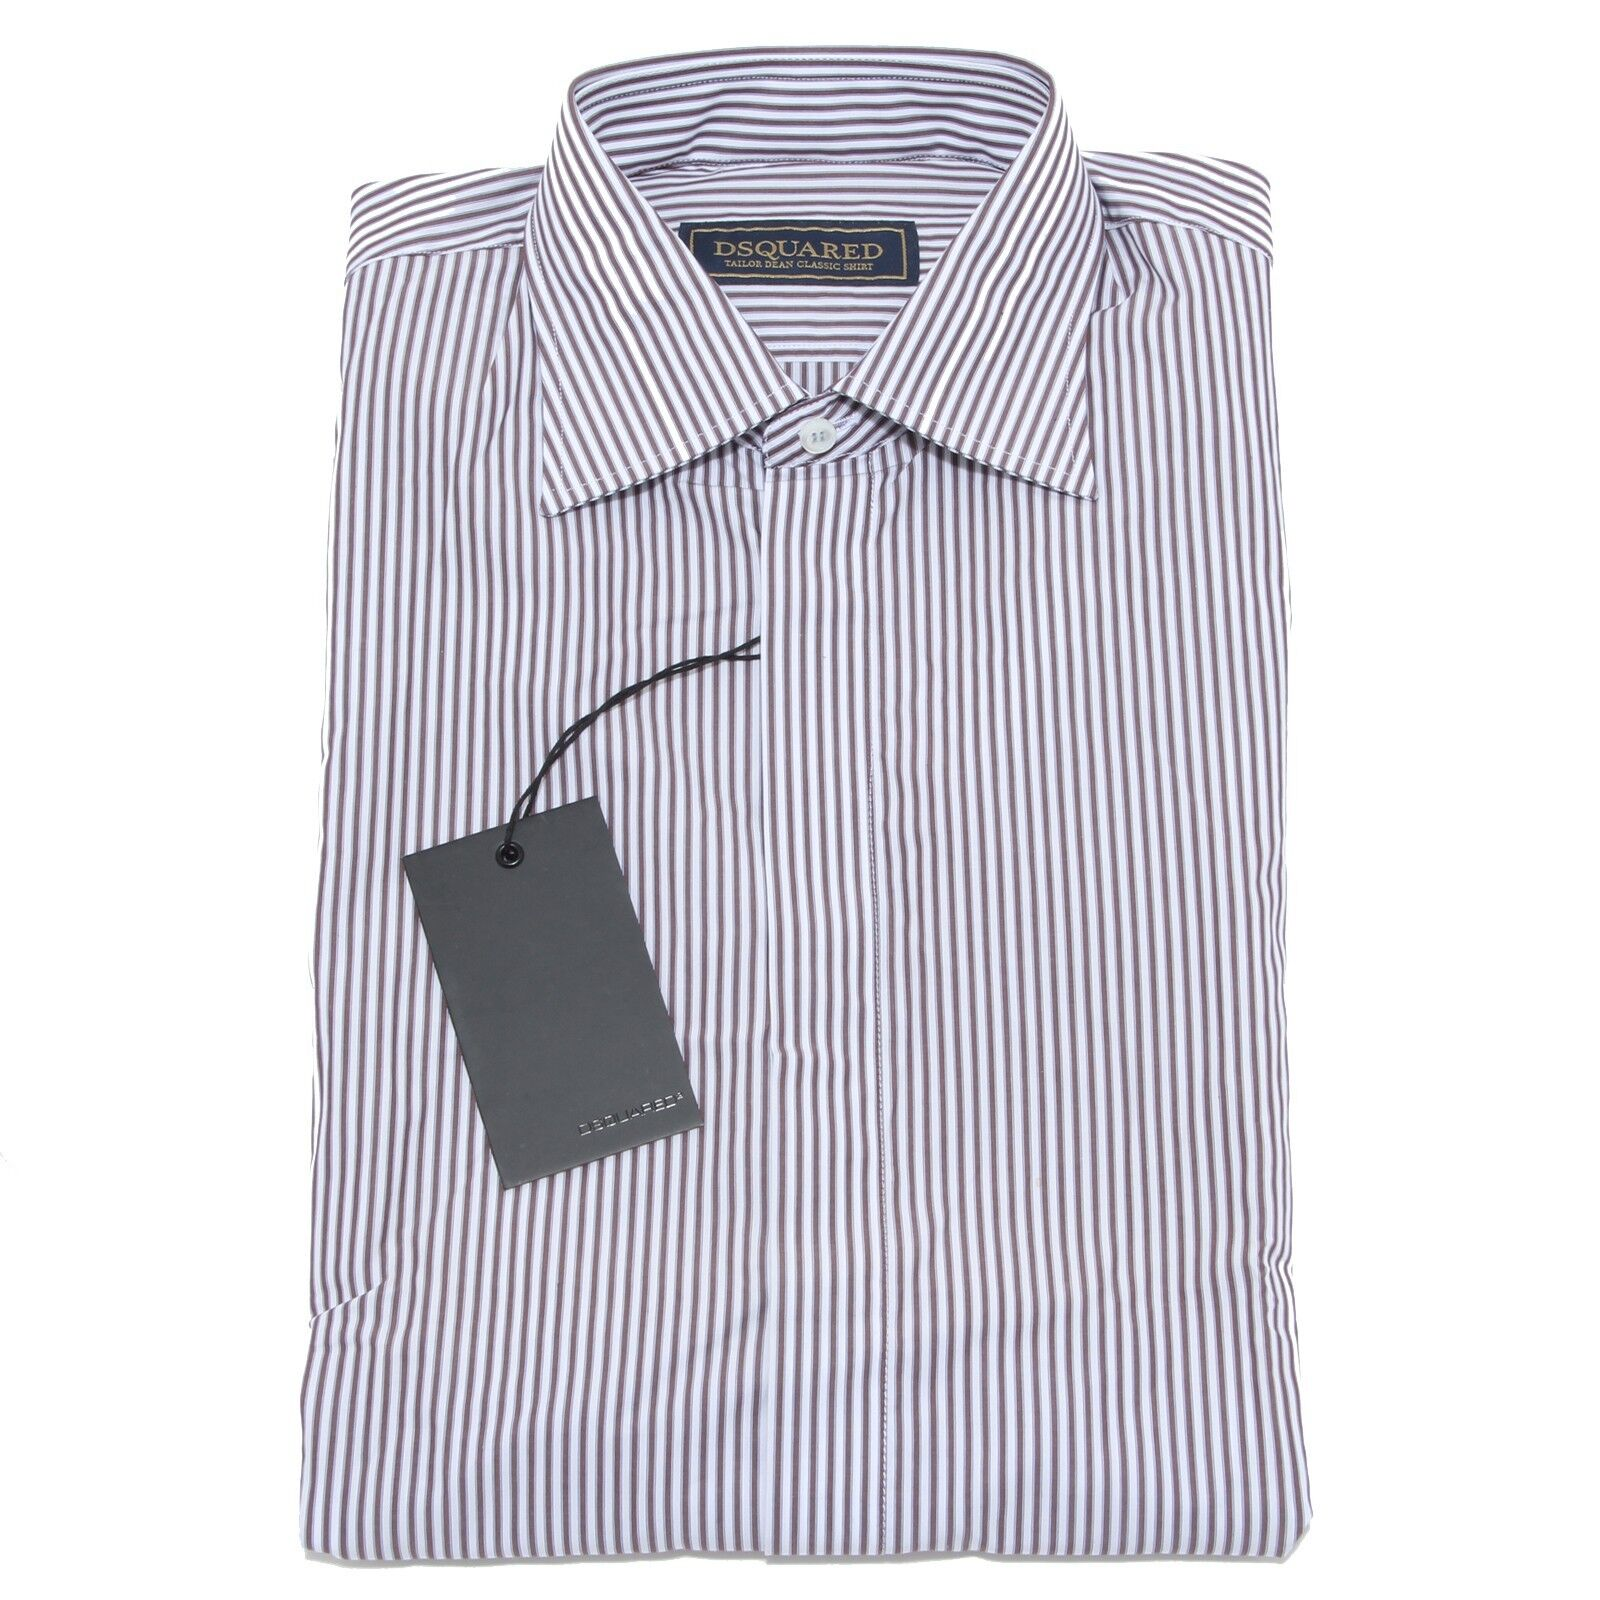 9626M camicia uomo DSQUARED shirt Uomo gessata bianco Marroneee